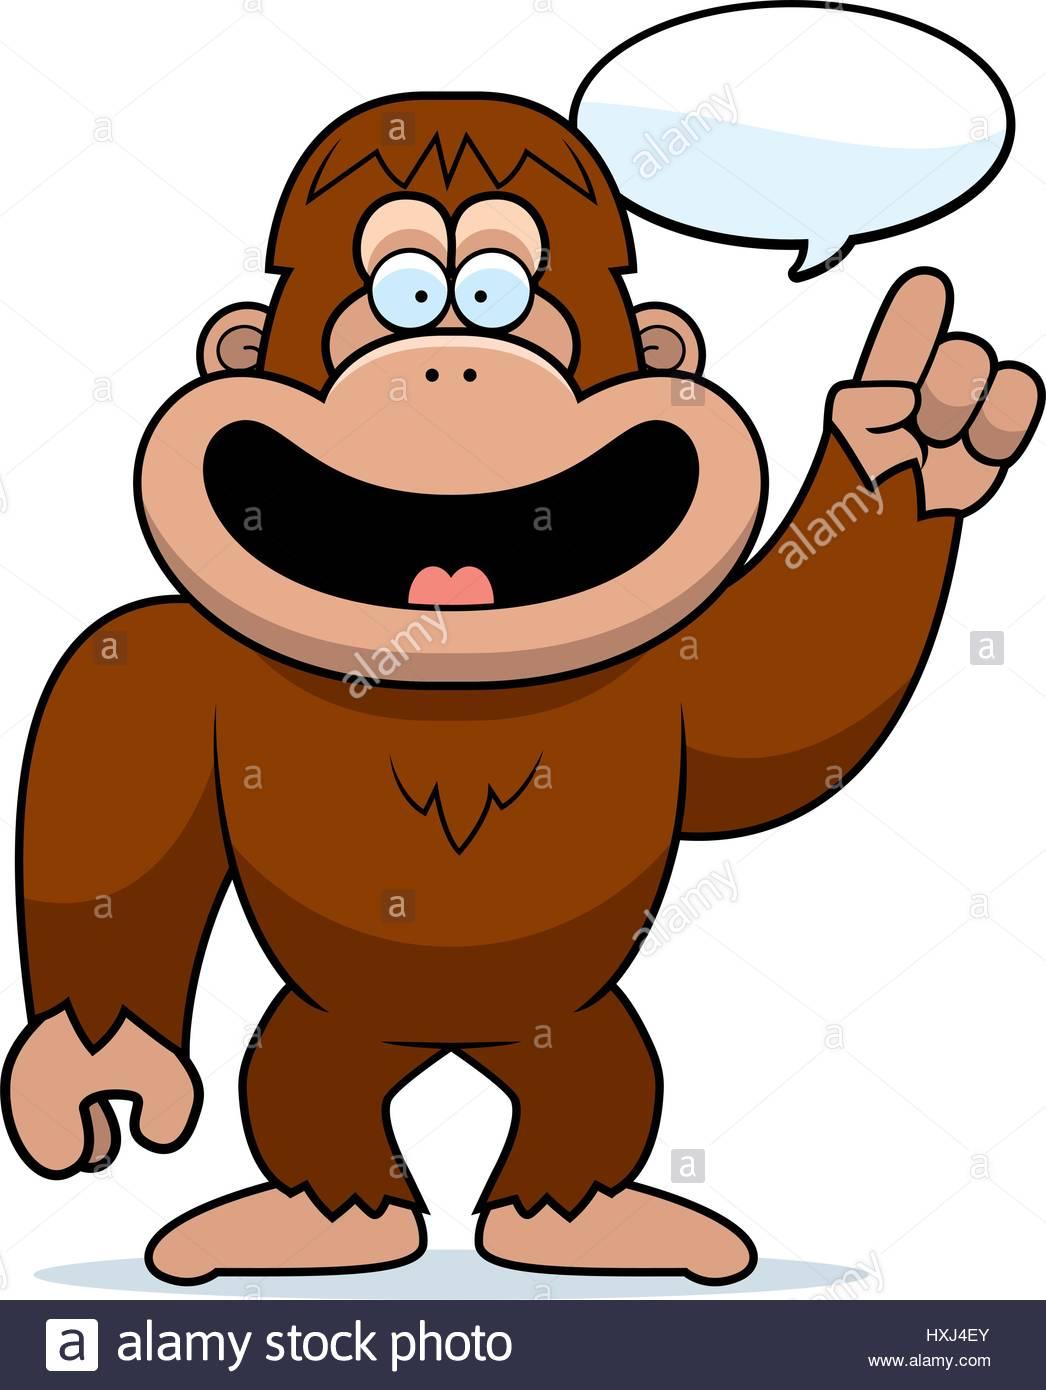 1046x1390 A Cartoon Illustration Of A Bigfoot Talking Stock Vector Art